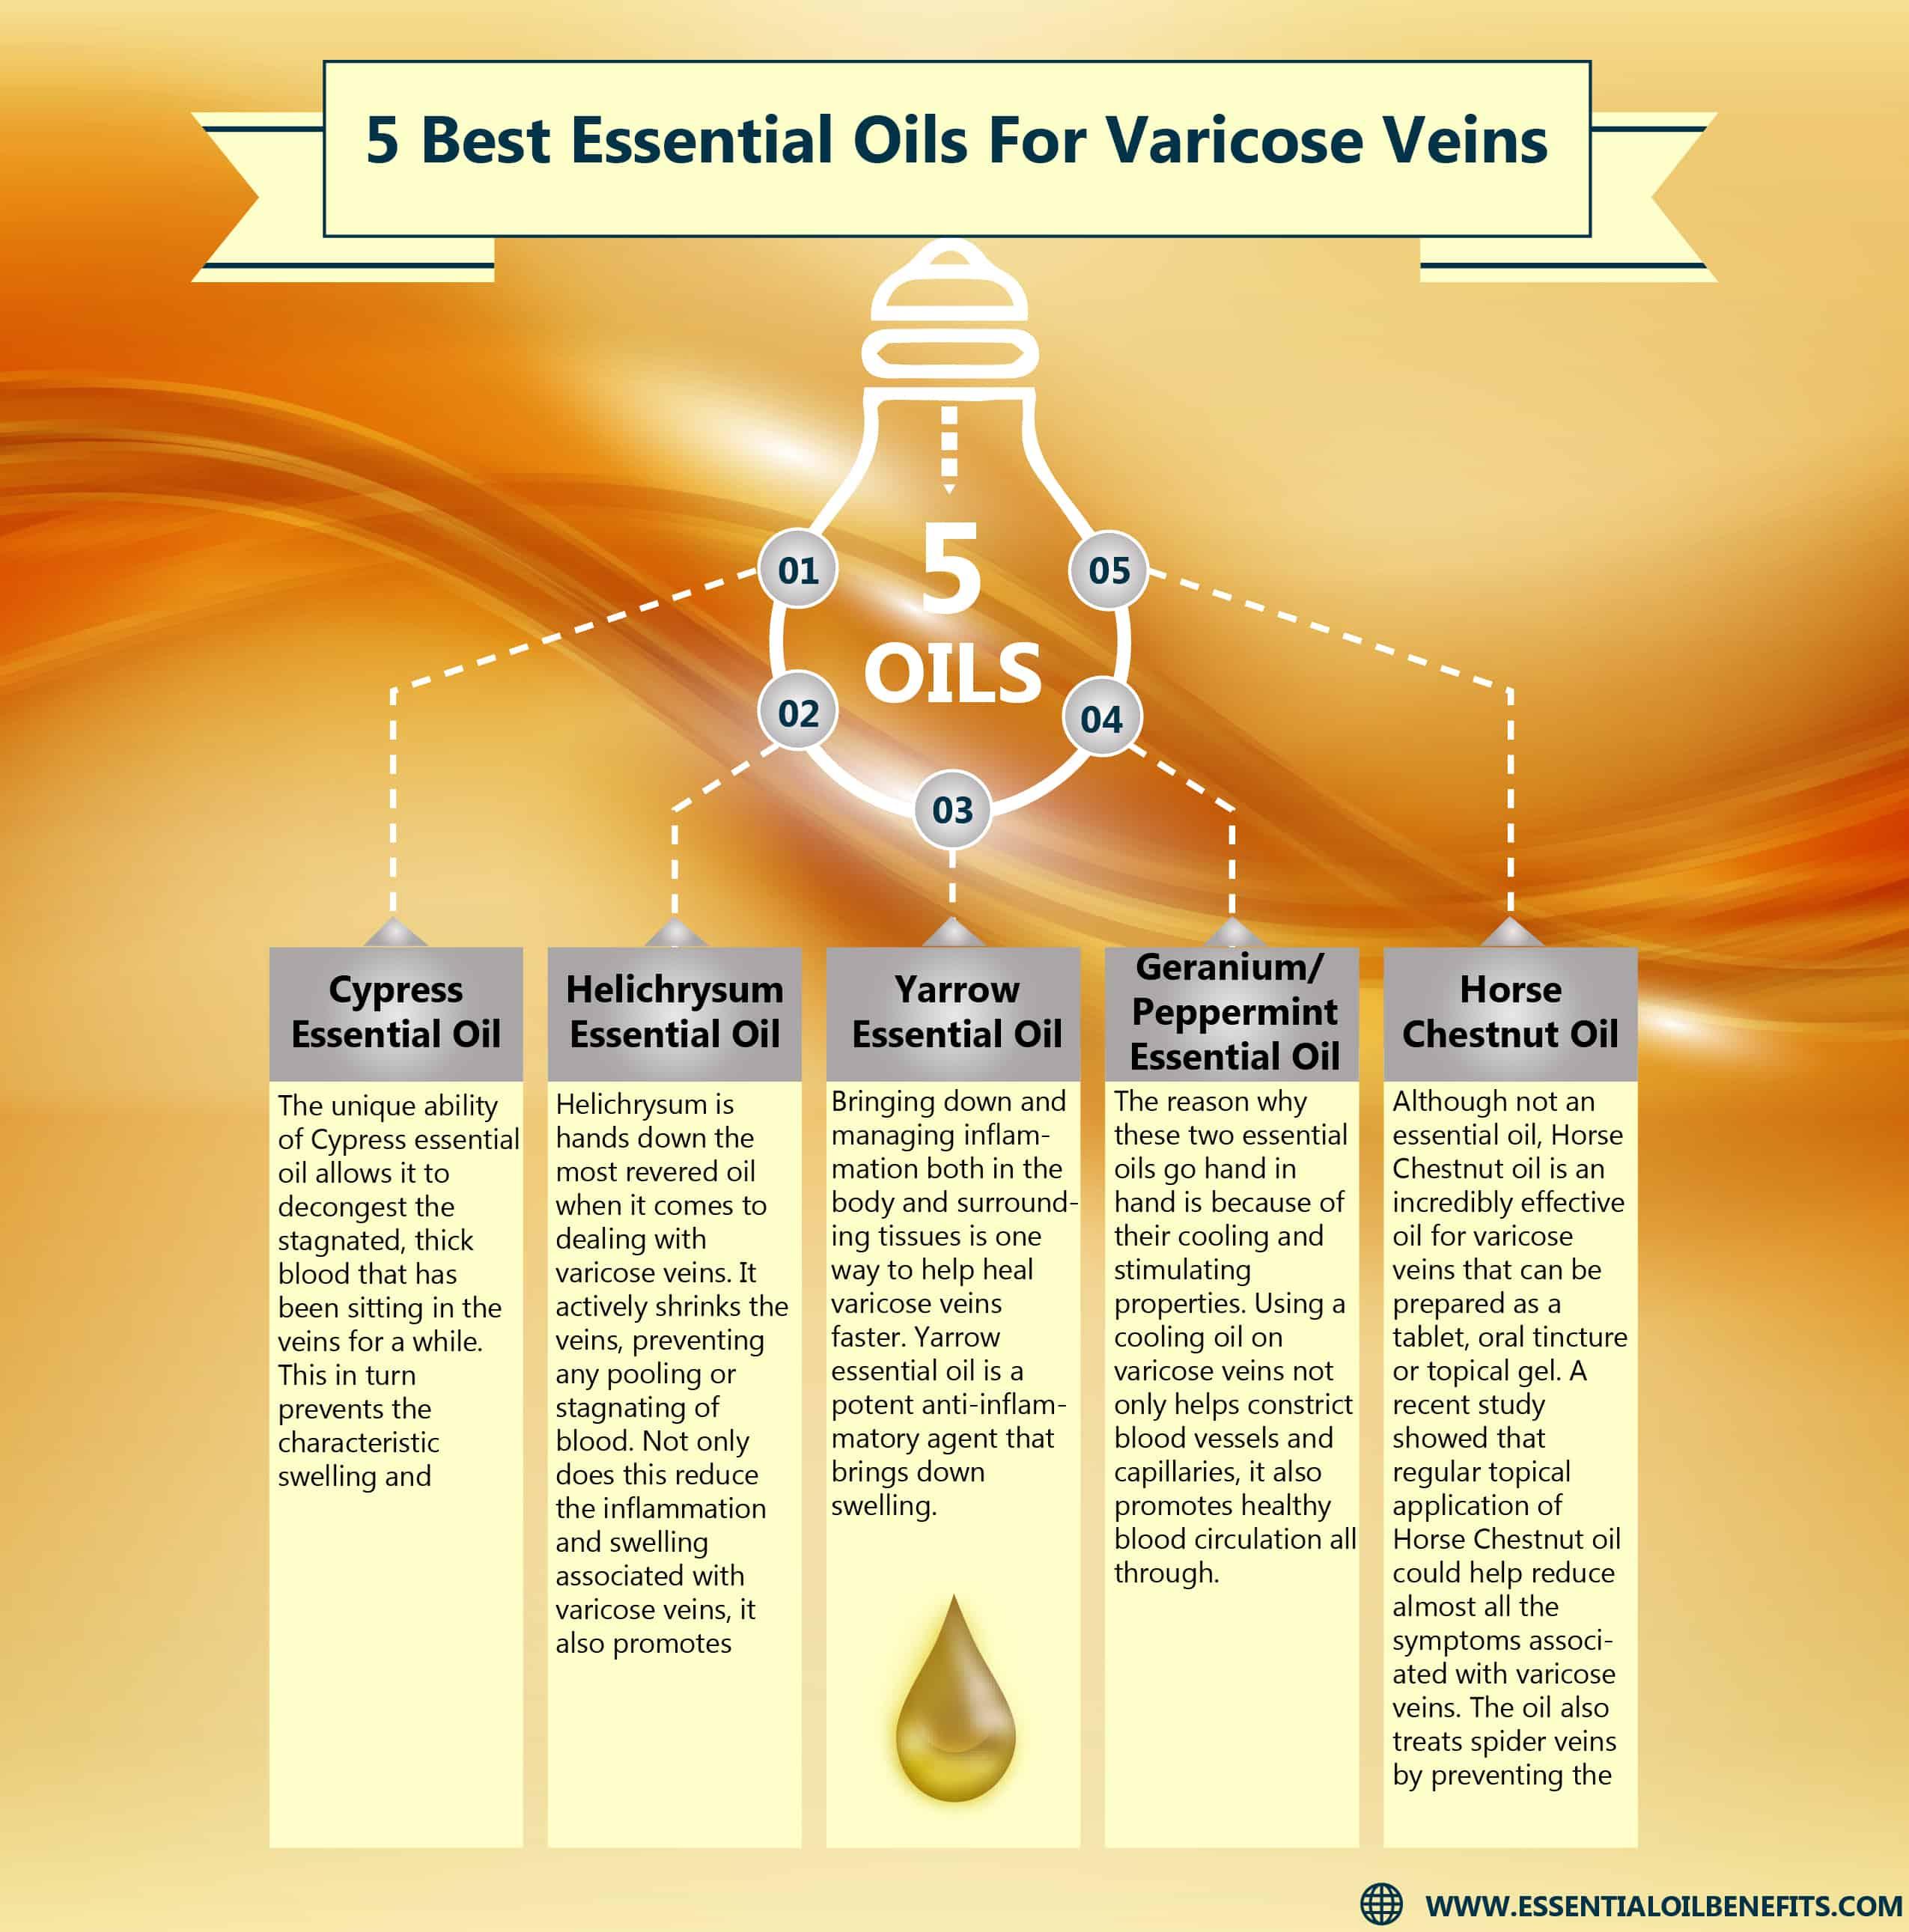 essential oils to treat varicose veins